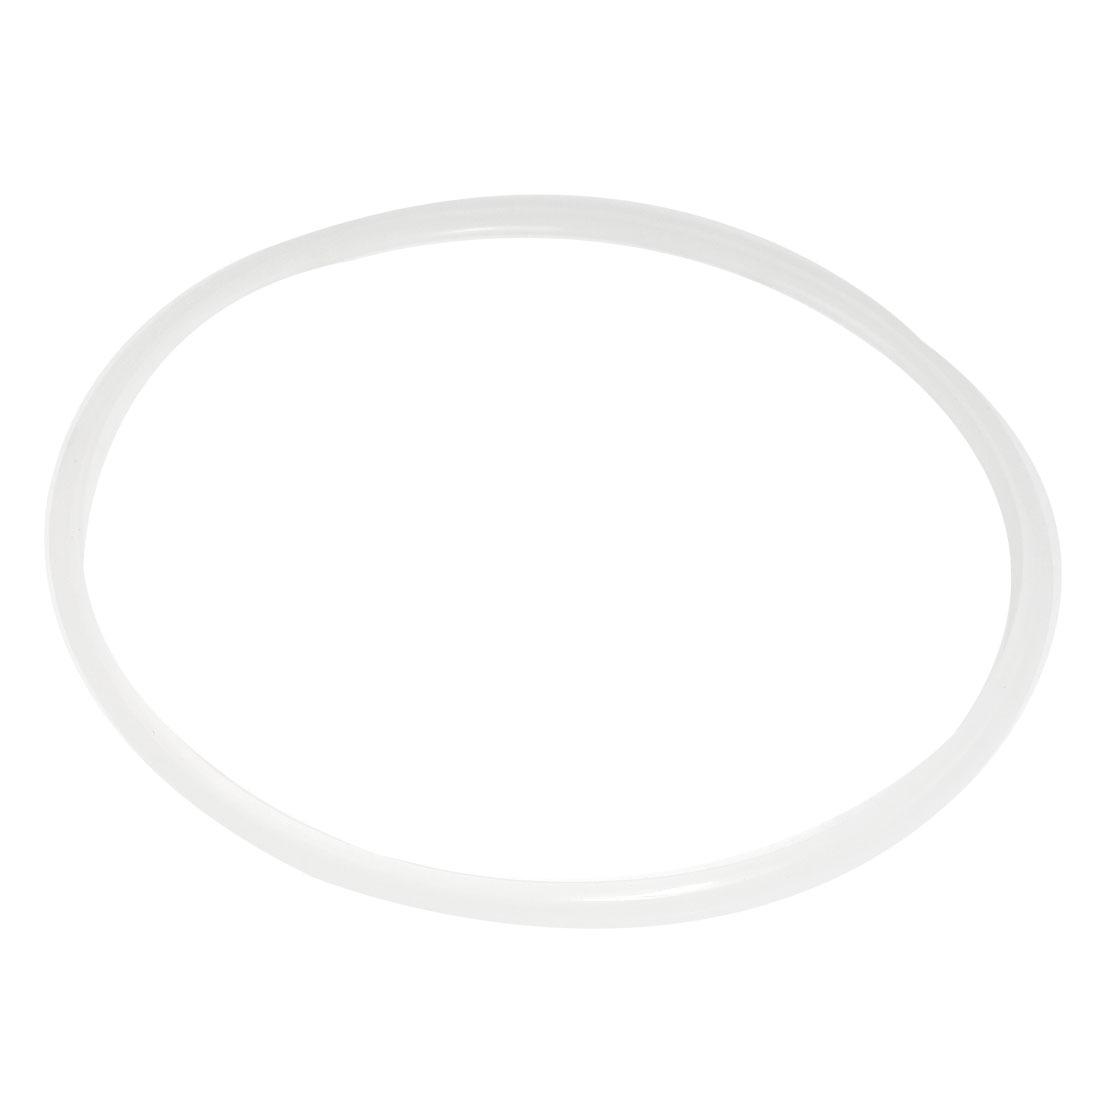 27cm Inside Diameter Home Pressure Cooker Rubber Gasket Sealing Ring